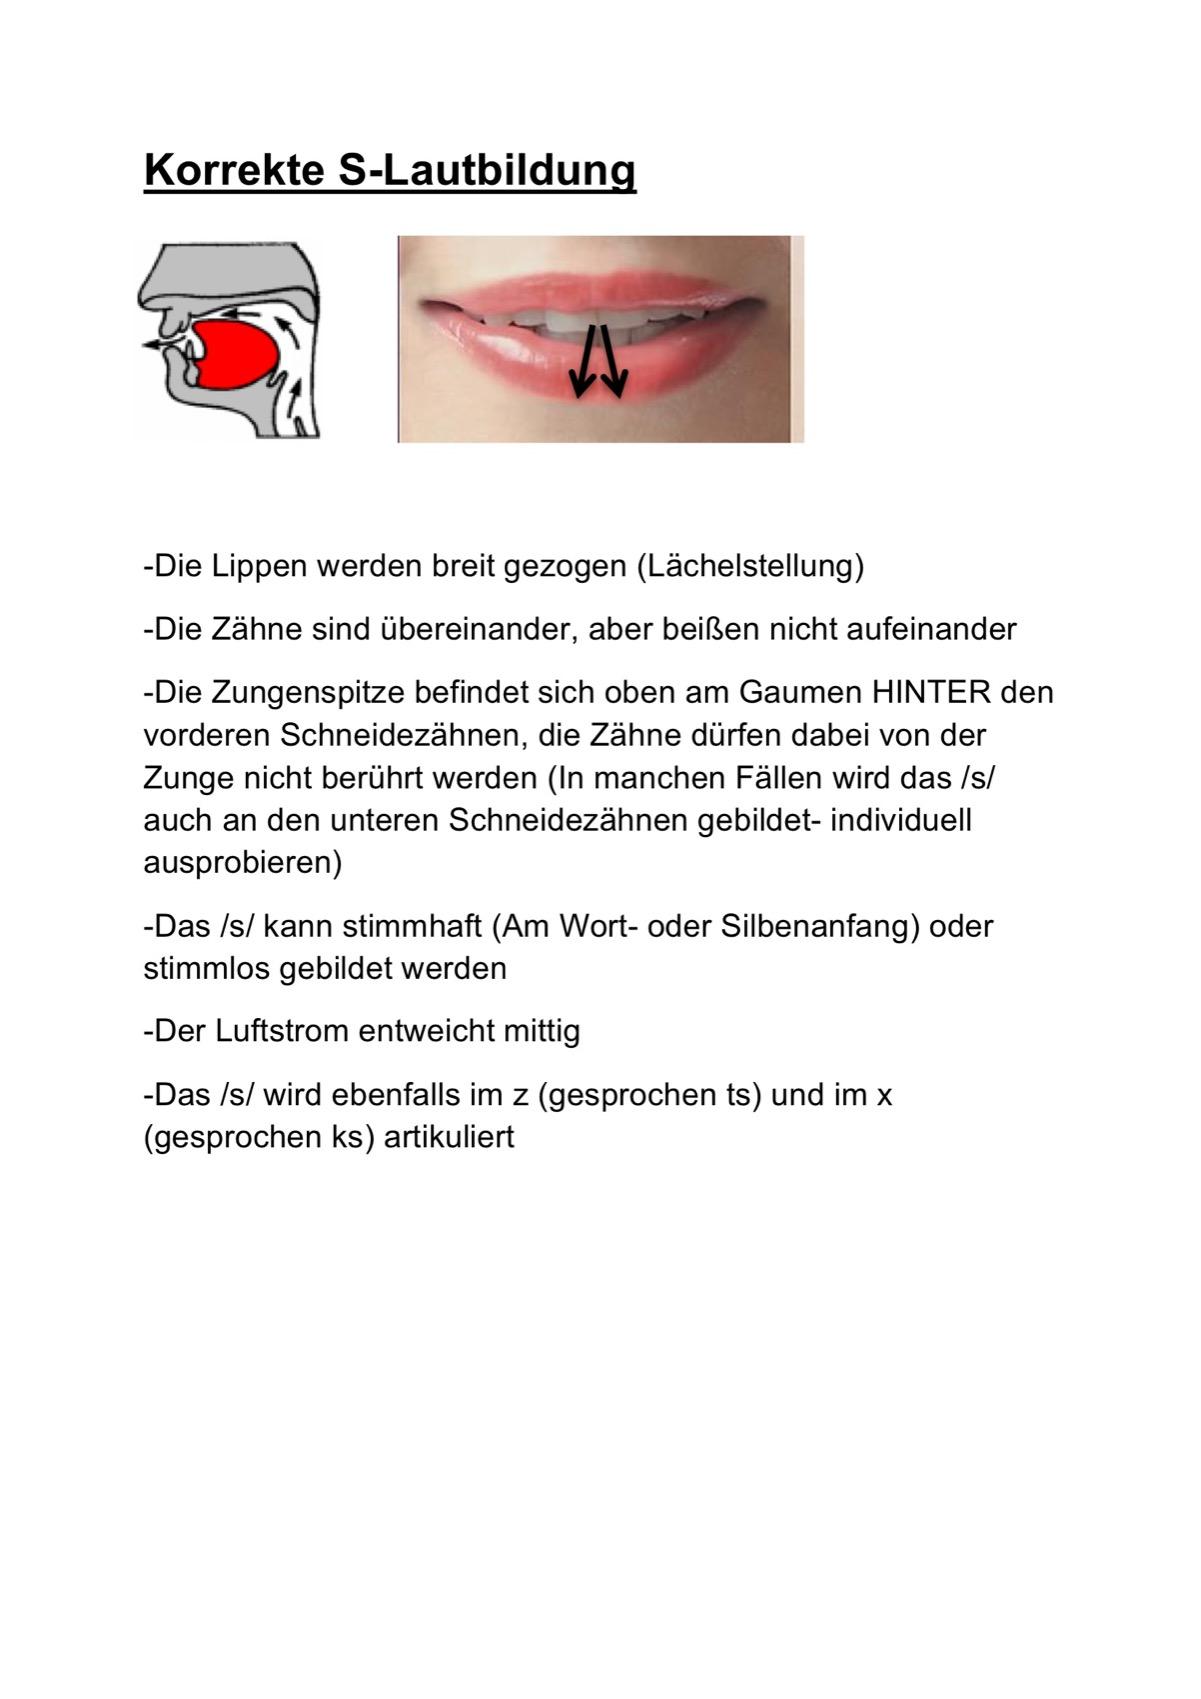 Sigmatismus bei Erwachsenen - Dysarthrophonie - madoo.net